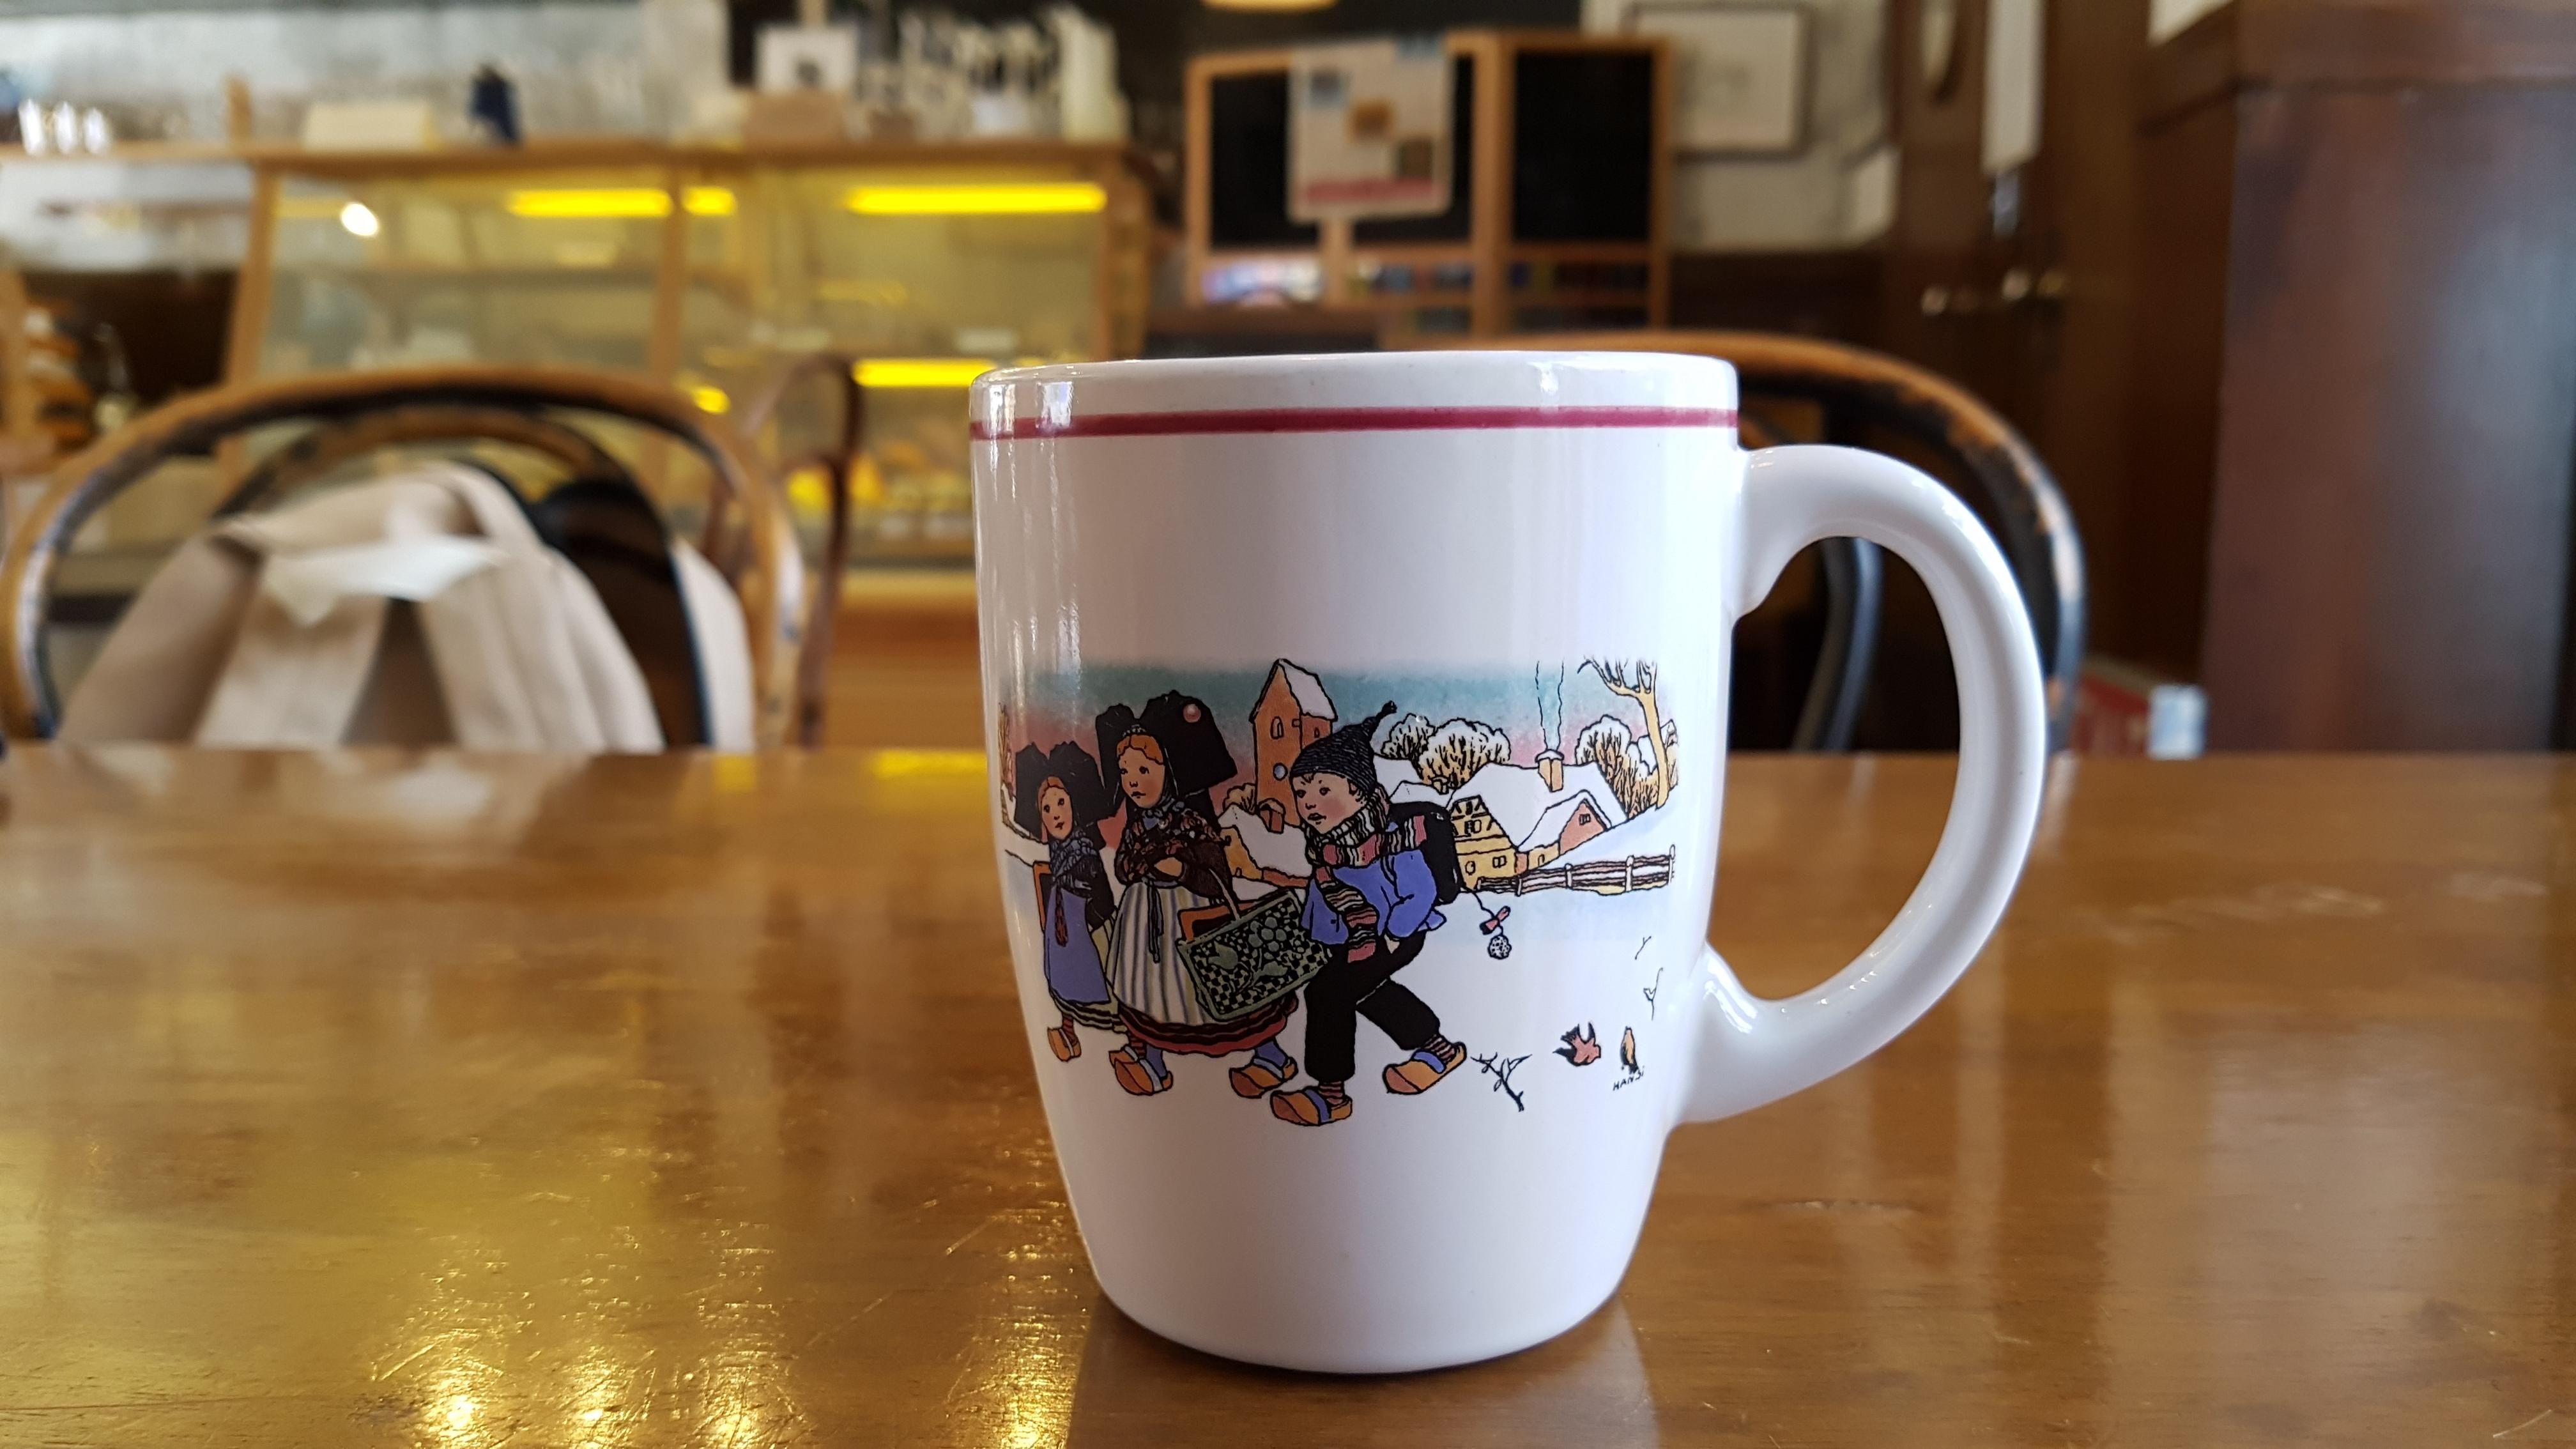 MANDERLEY, [수유 카페] 멘델리 - 인테리어가 정말 죽여줘요!!, 가격, 공부, 궁궐 빨래, 궁중 빨래, 귀여운 컵, 김스타, 단체 손님, 동네 카페, 뚜딱, 만달리, 메뉴, 메뉴판, 메인홀, 멘델리, 북한산, 빨래골 유래, 빨래골 카페, 속옷 빨래, 수다, 수유, 수유 빨래골, 수유 카페, 식물, 아메리카노 가격, 야외, 양장본, 음료, 인테리어, 재즈 카페, 책, 책 읽는 카페, 커피 맛, 컴퓨터, 특이한 화장실, 화장실, 흑인 재즈 카페